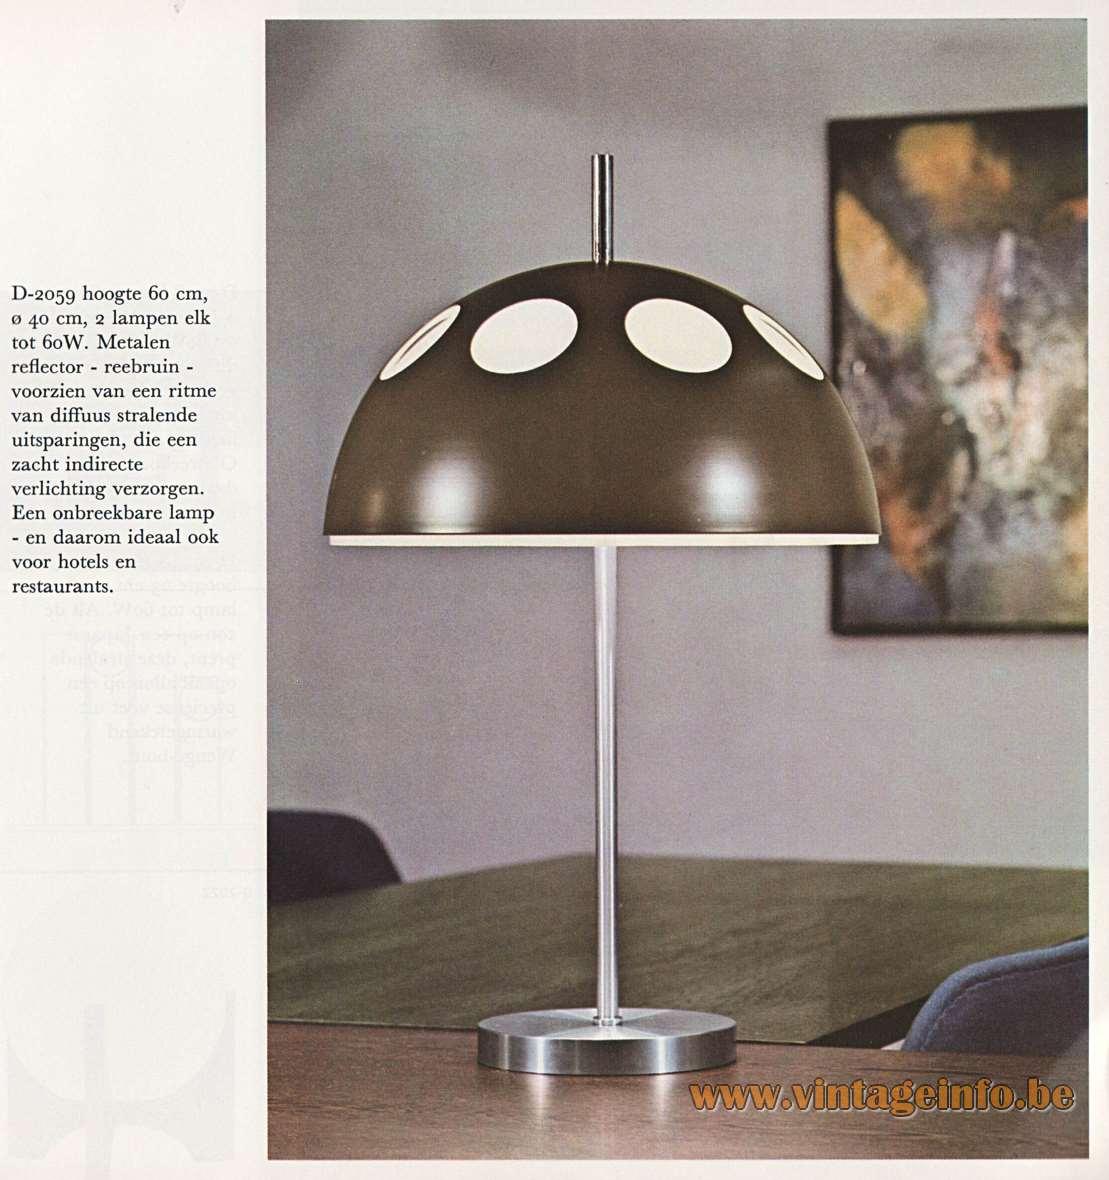 Raak Pendant Lamp –Vintage Info – All About Vintage Lighting